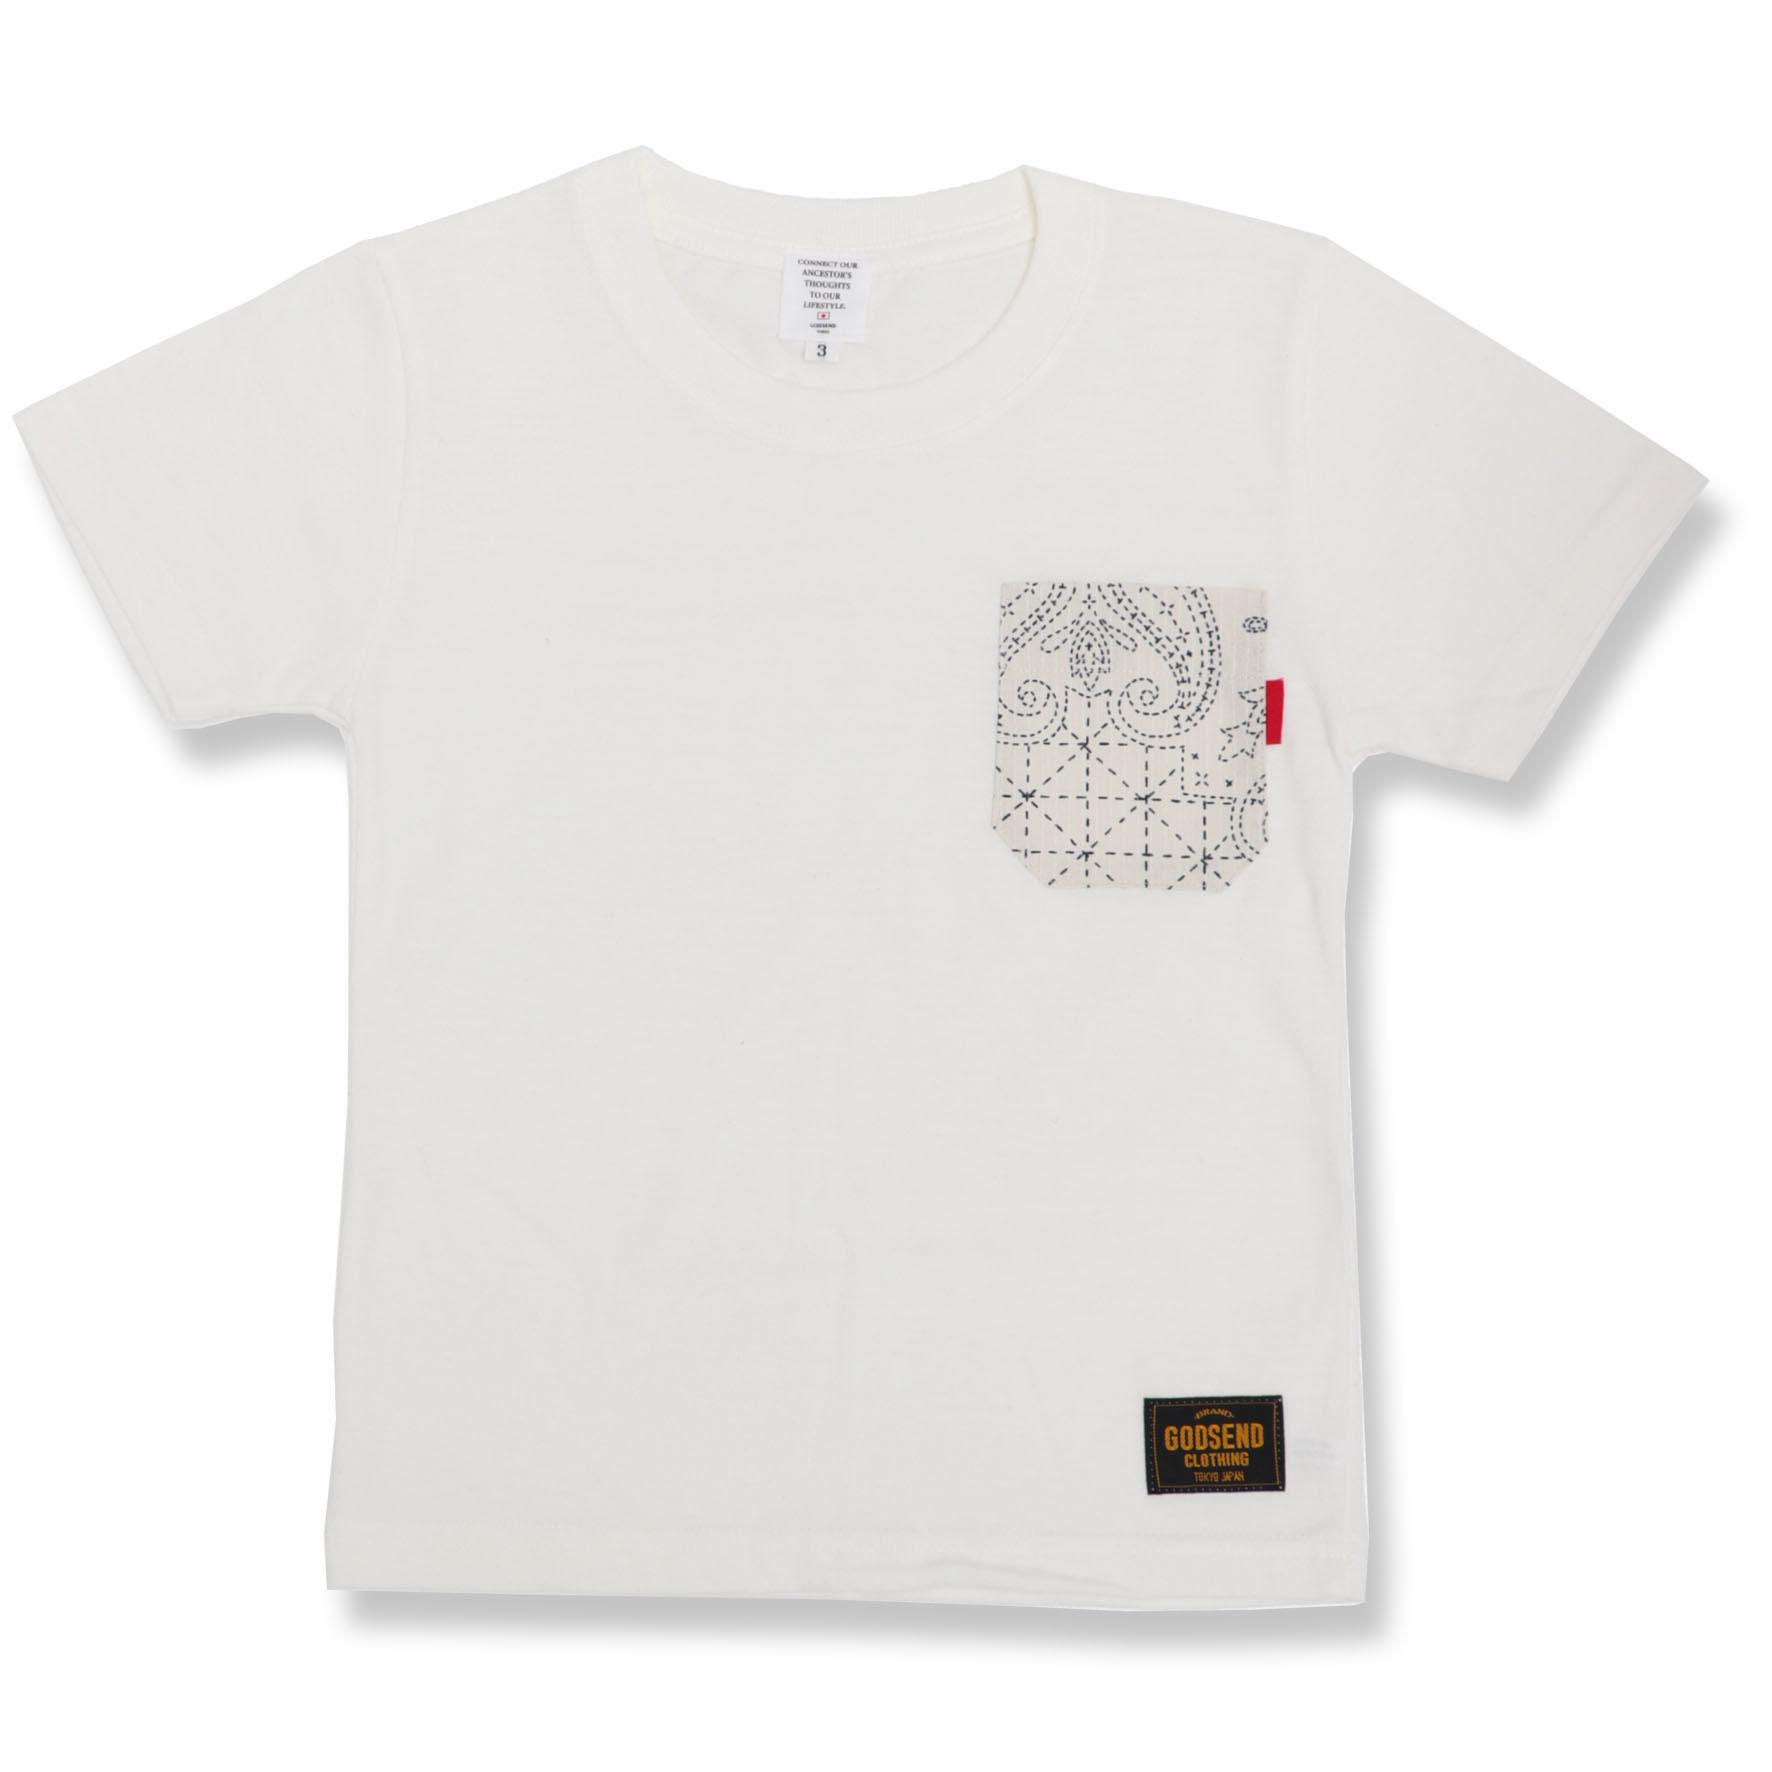 SASHIKO  PAISLEY  TEE ADULT 刺し子ペイズリーTシャツ大人サイズ